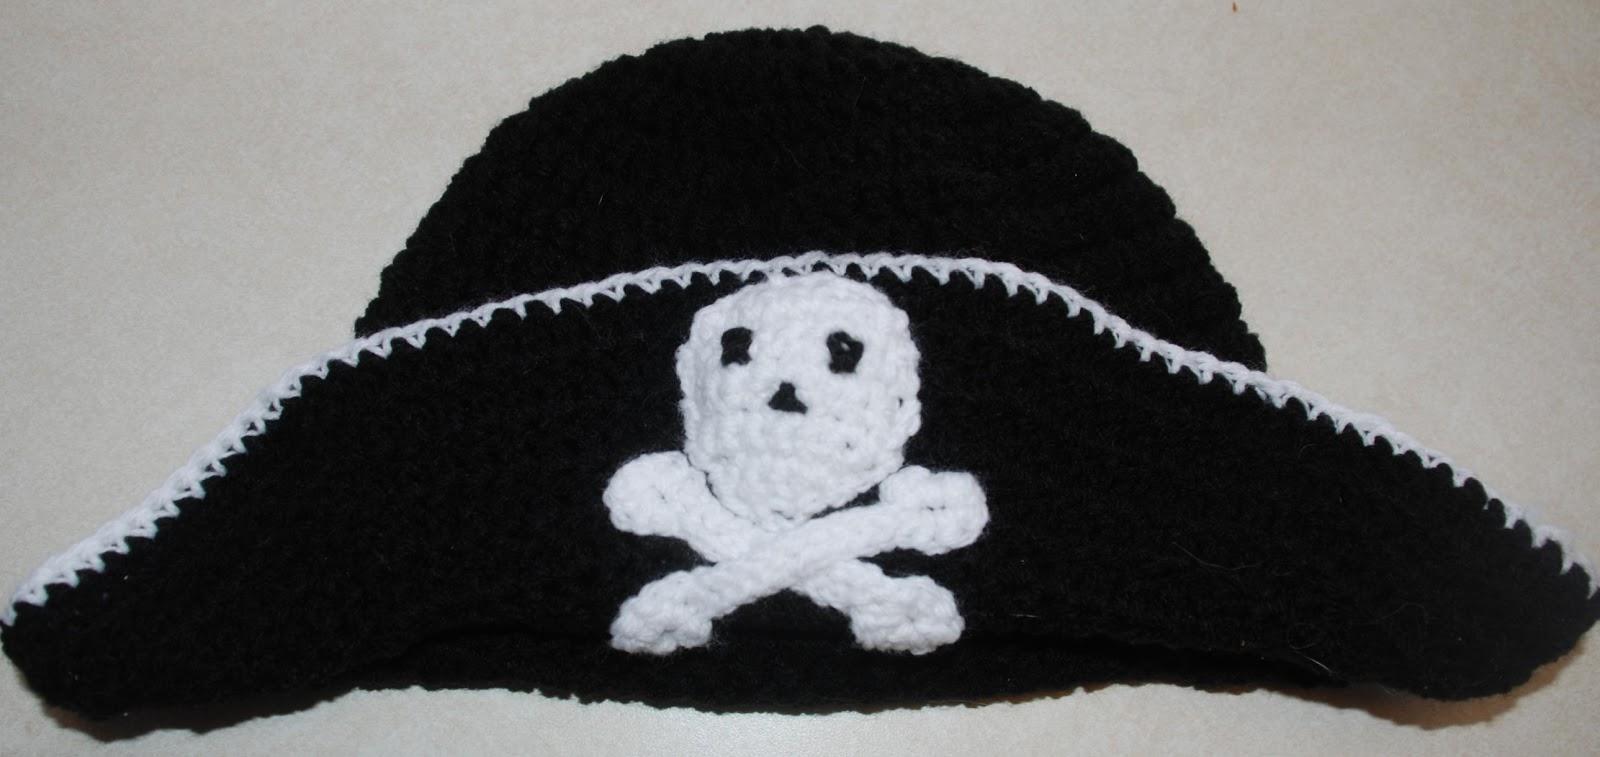 Crochet baby pirate hat pattern dancox for amys crochet creative creations crochet child pirate hat bankloansurffo Choice Image